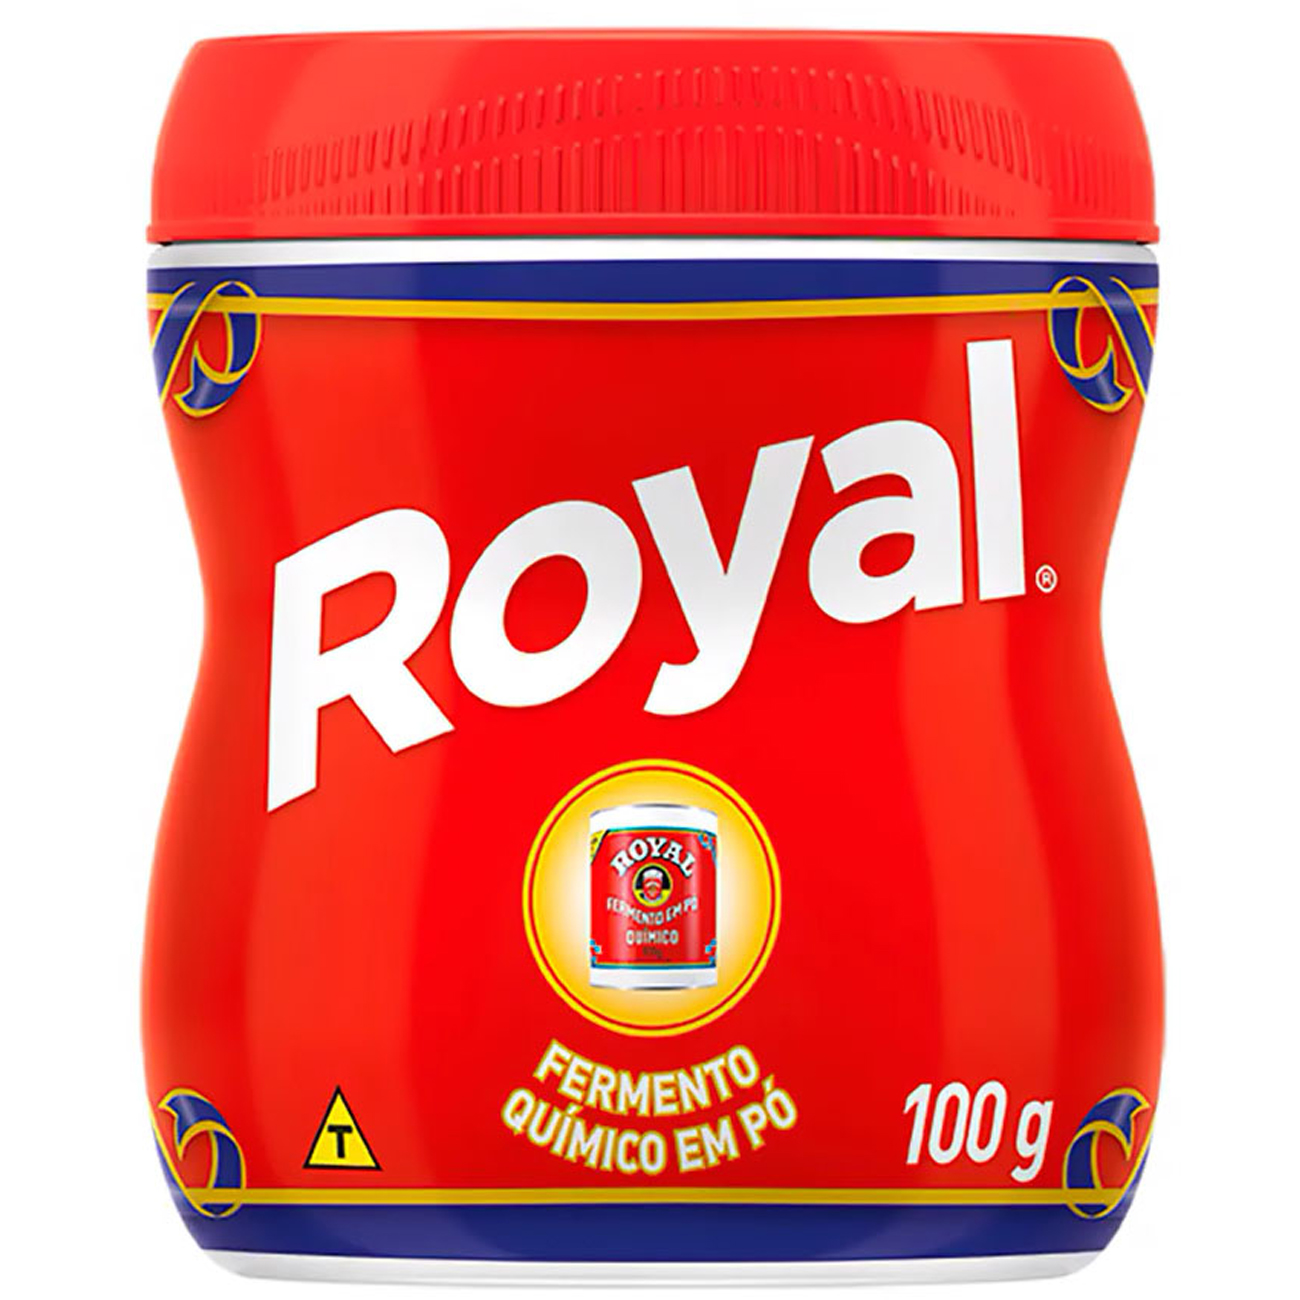 Fermento em Po Royal 100G Promacao Leve 12 Pague 11